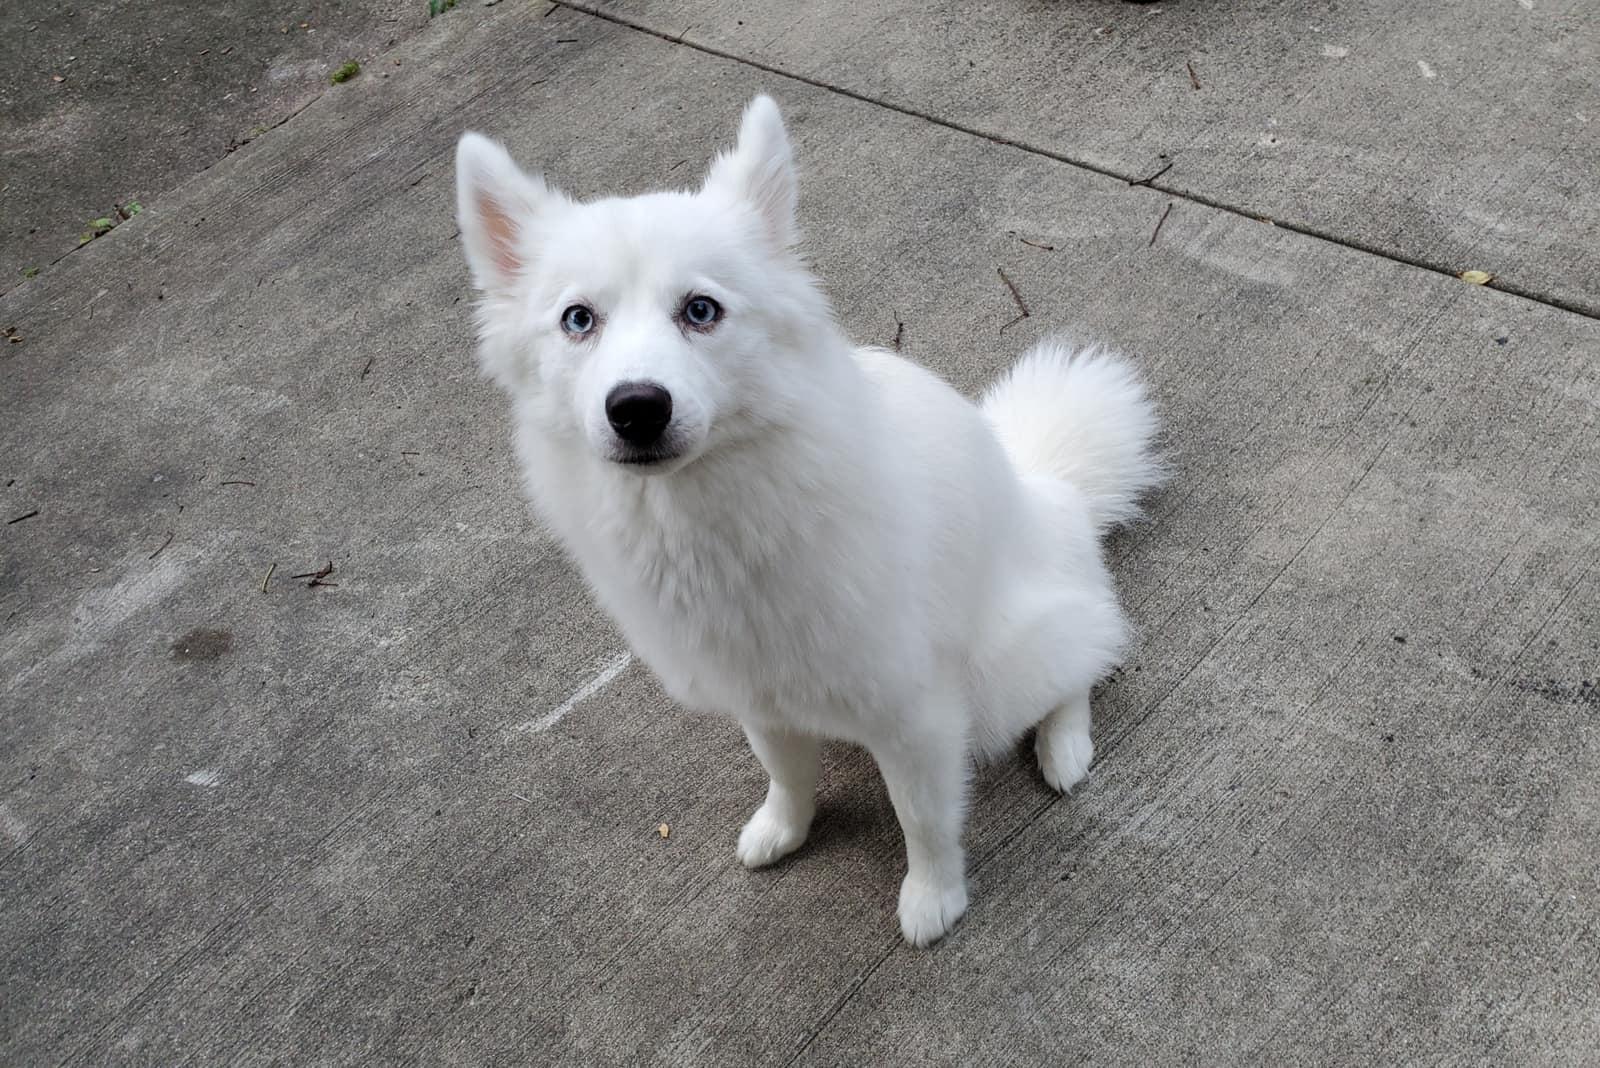 a white hound sitting on a concrete pavement